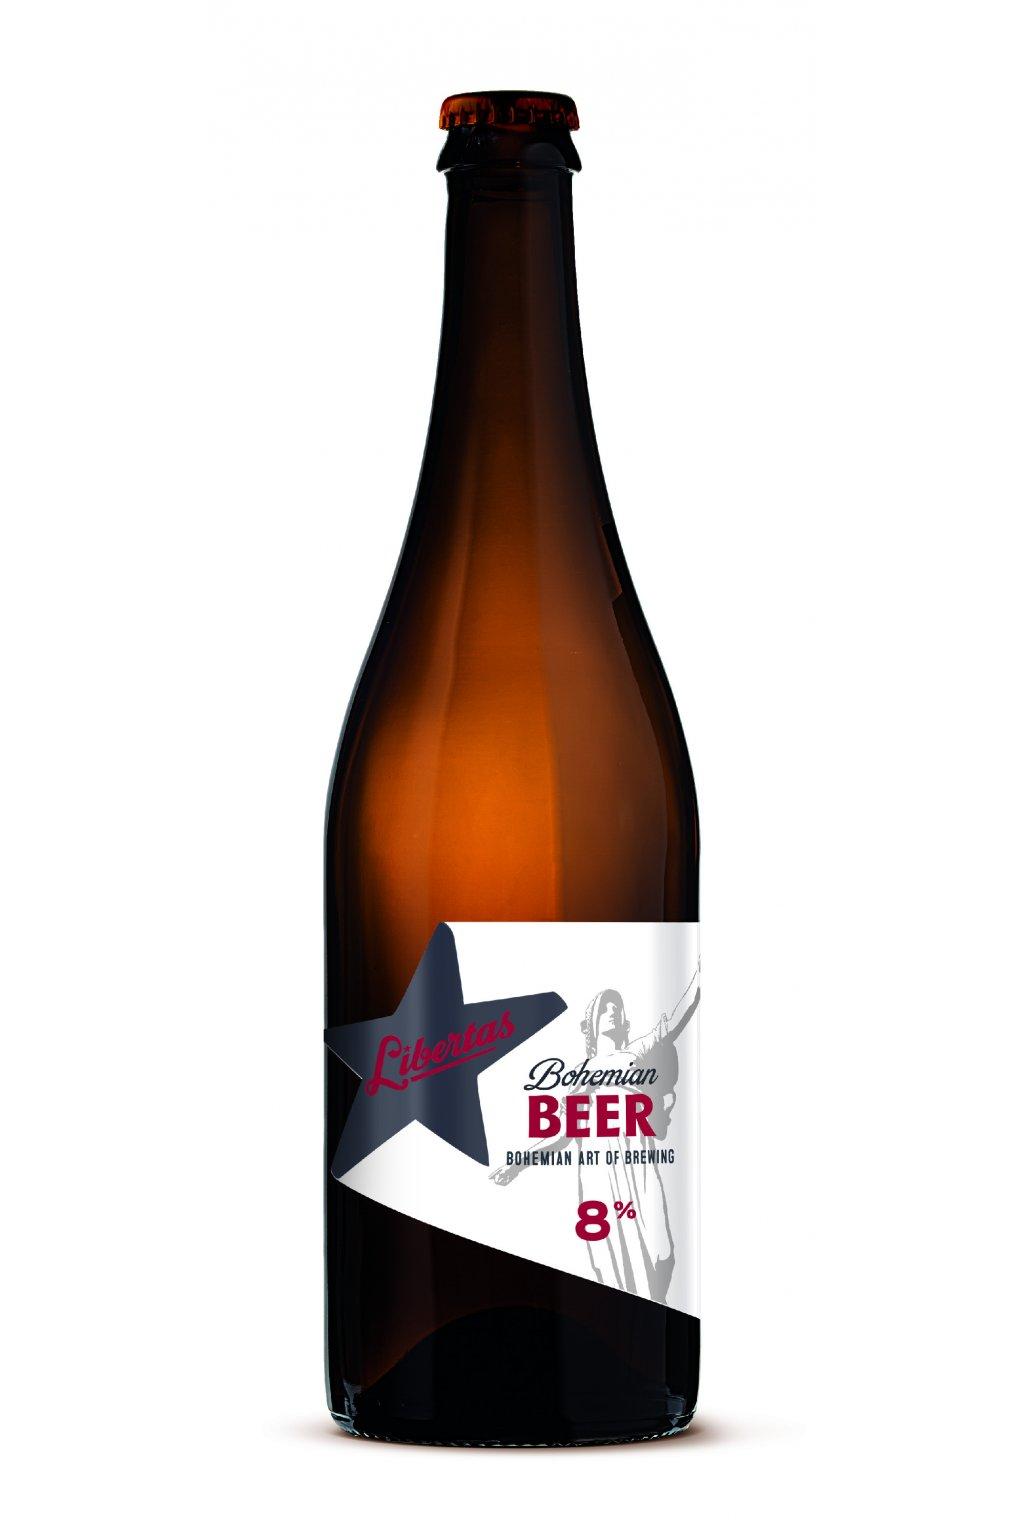 LBT003 20 Libertas Bohemian beer 8 CMYK 300dpi